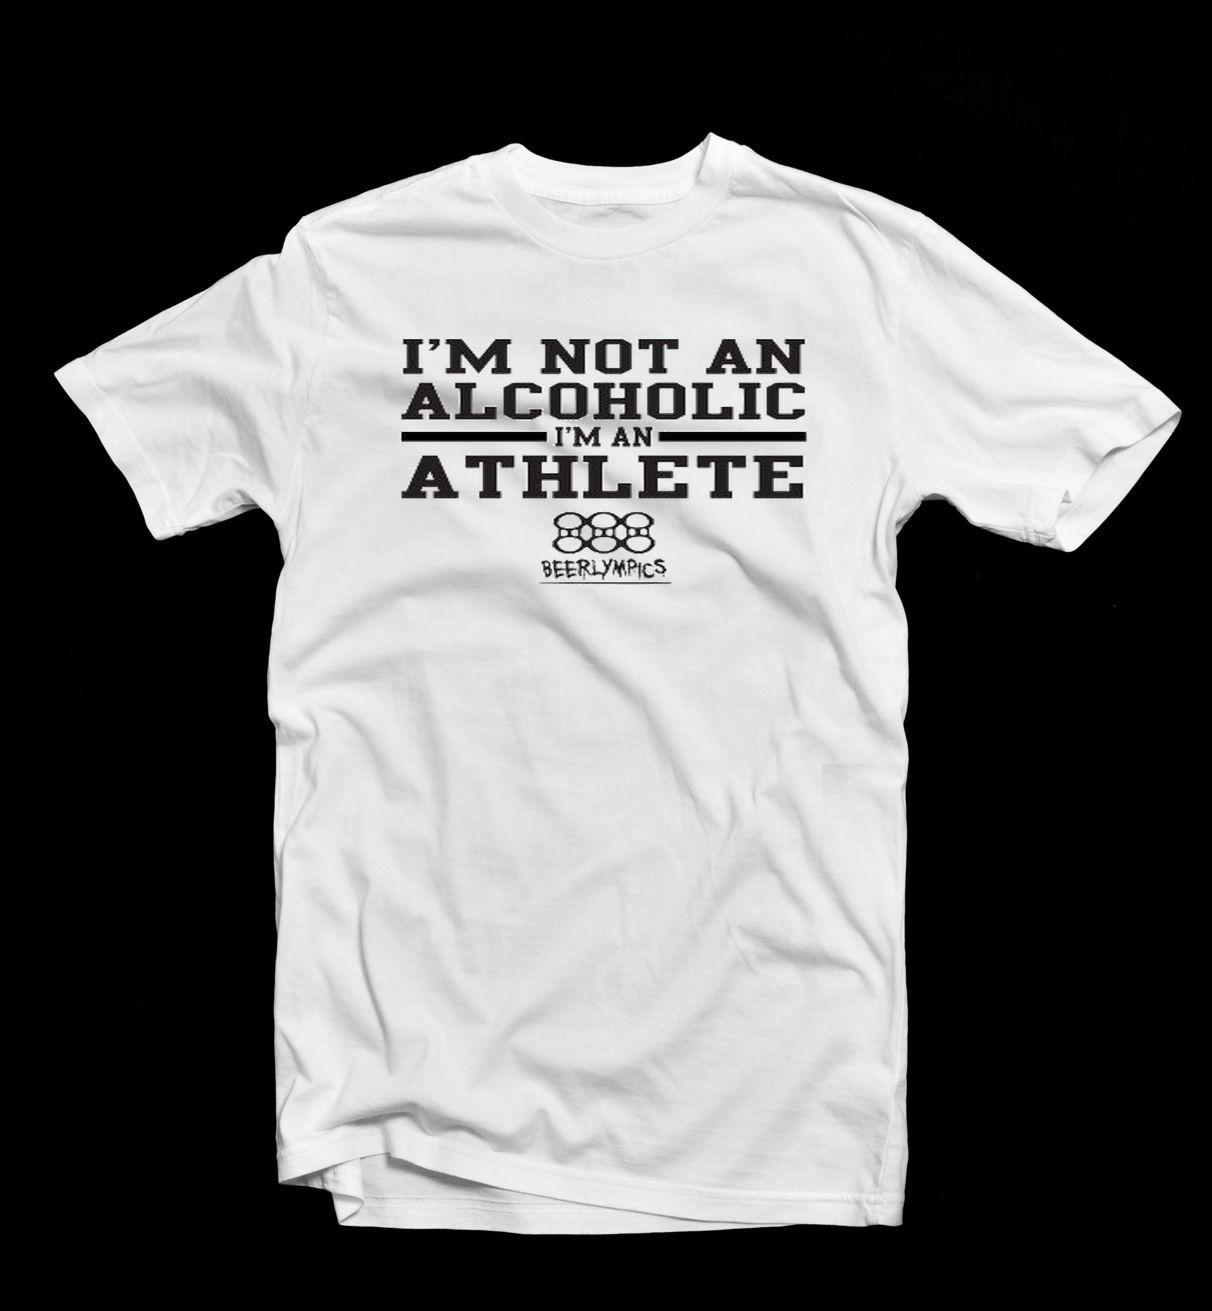 Beer olympics t-shirt www.envymytee.com